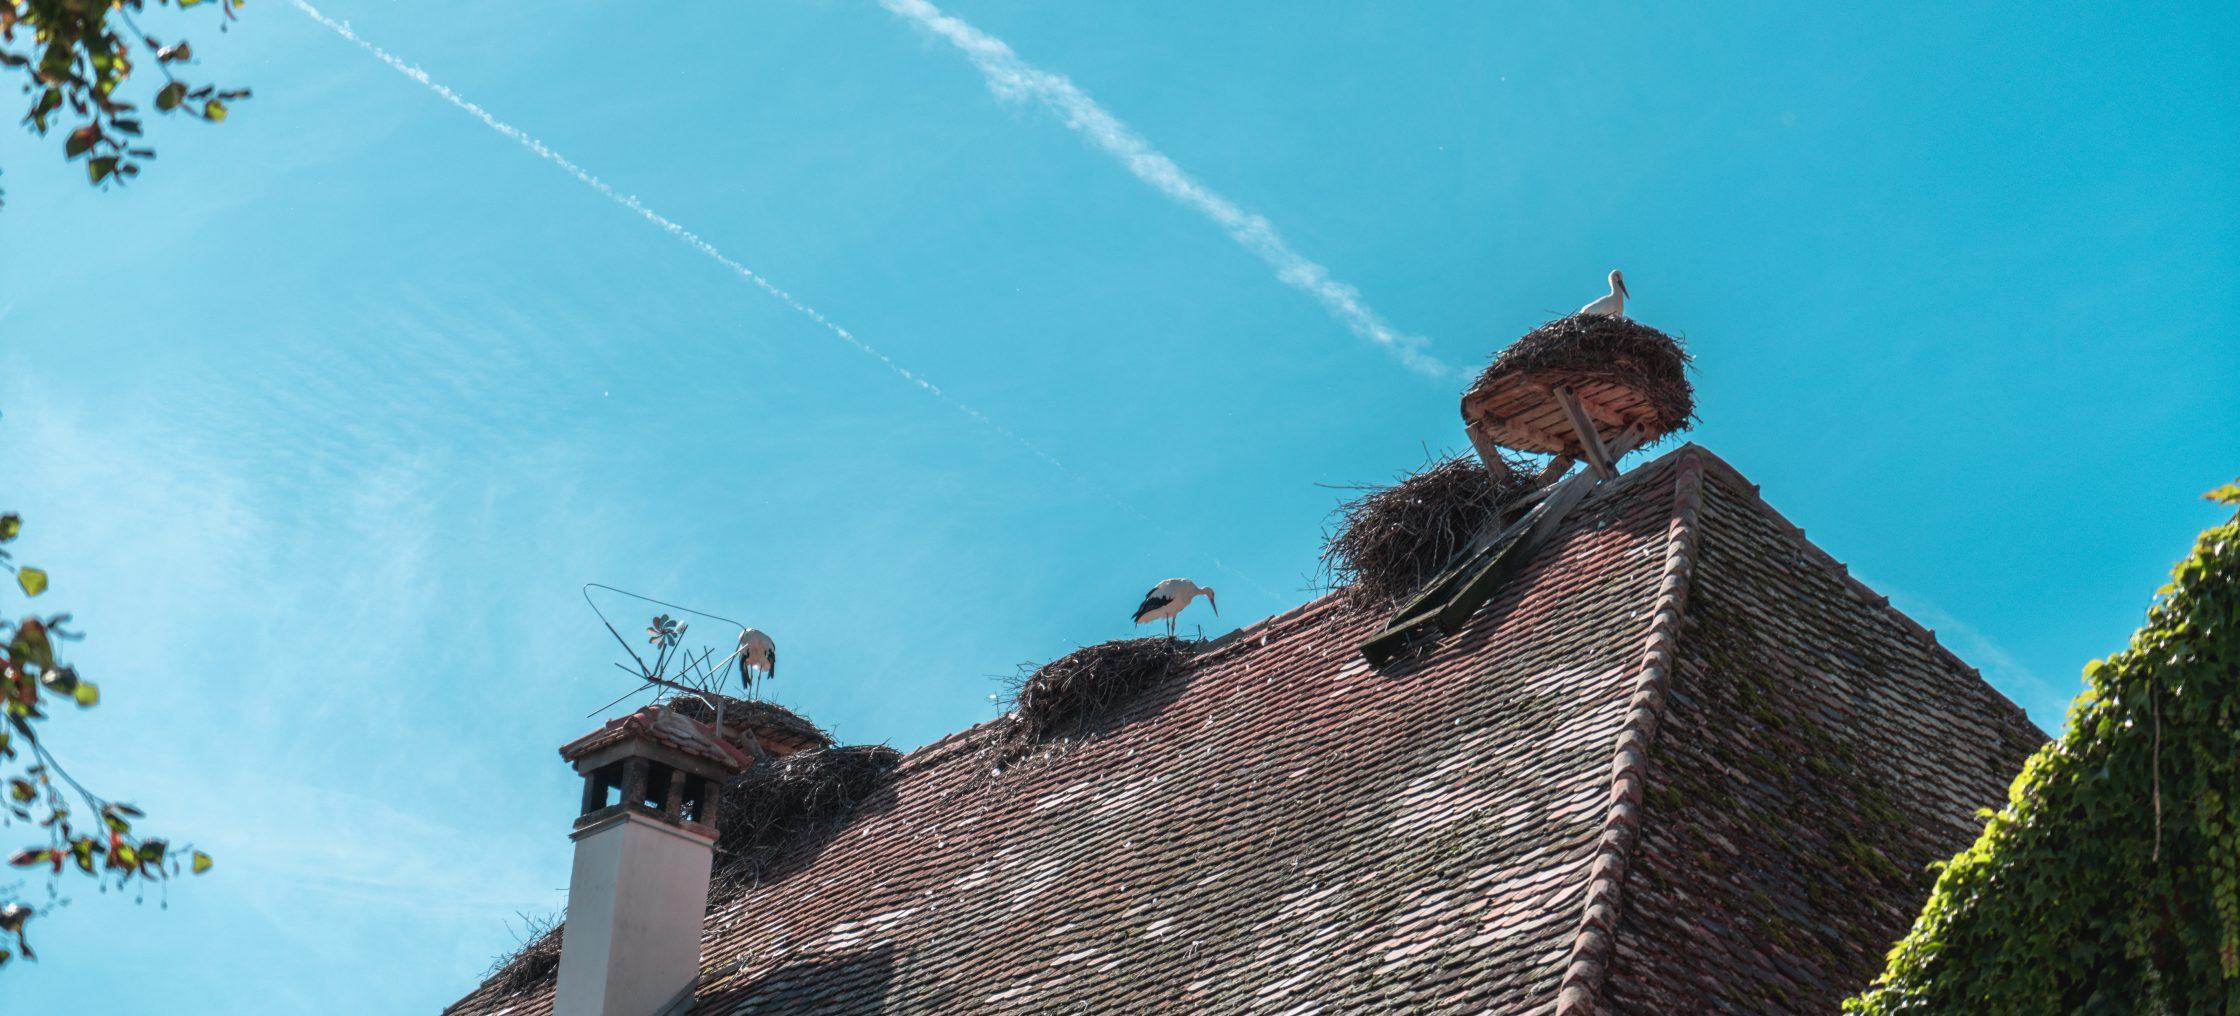 Bodensee Affenberg Storchnest